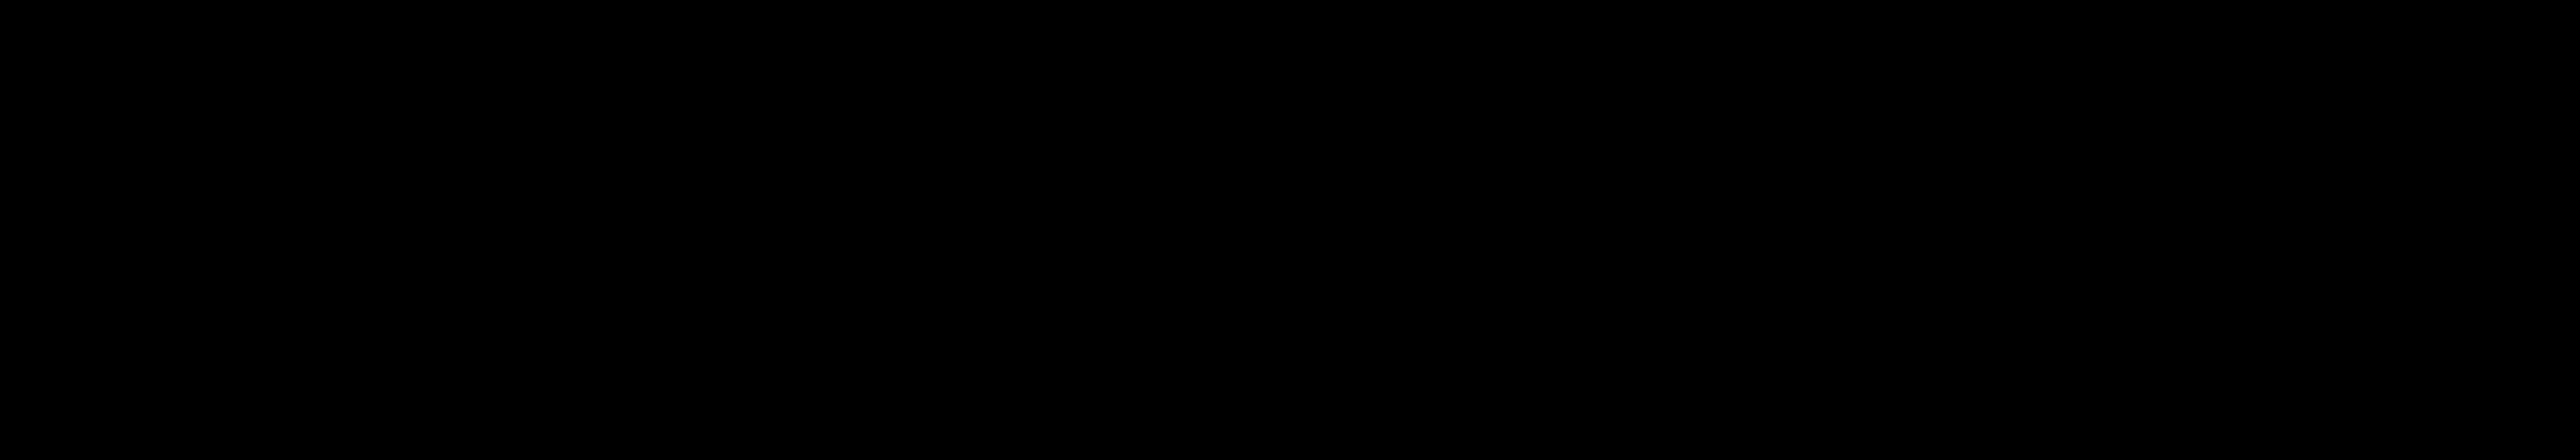 Roblox Logo.